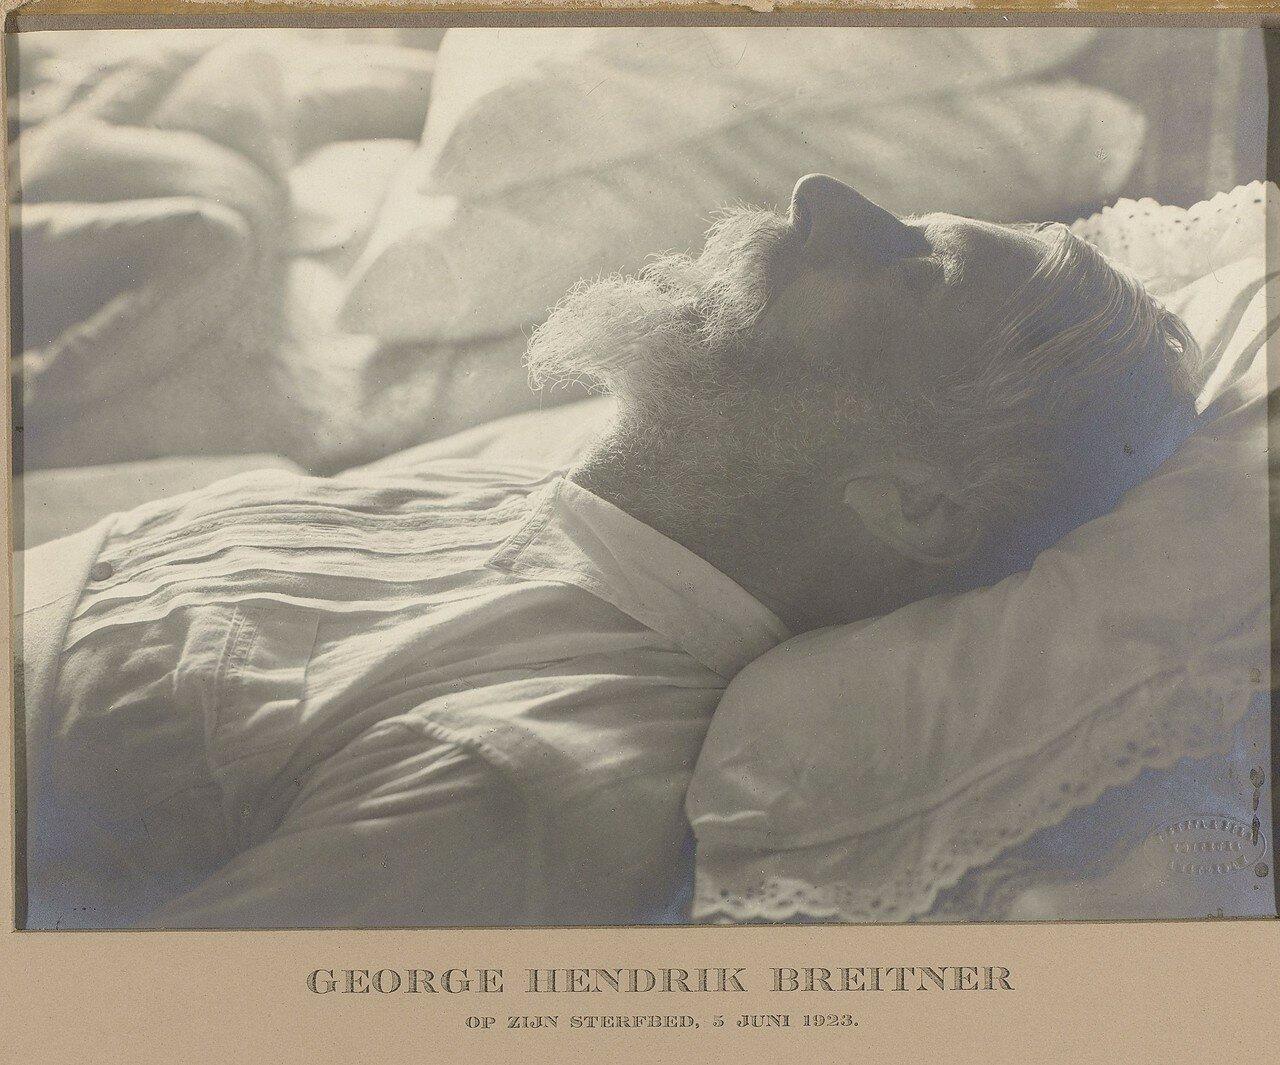 1923. Георг Хендрик Брейтнер на смертном одре.